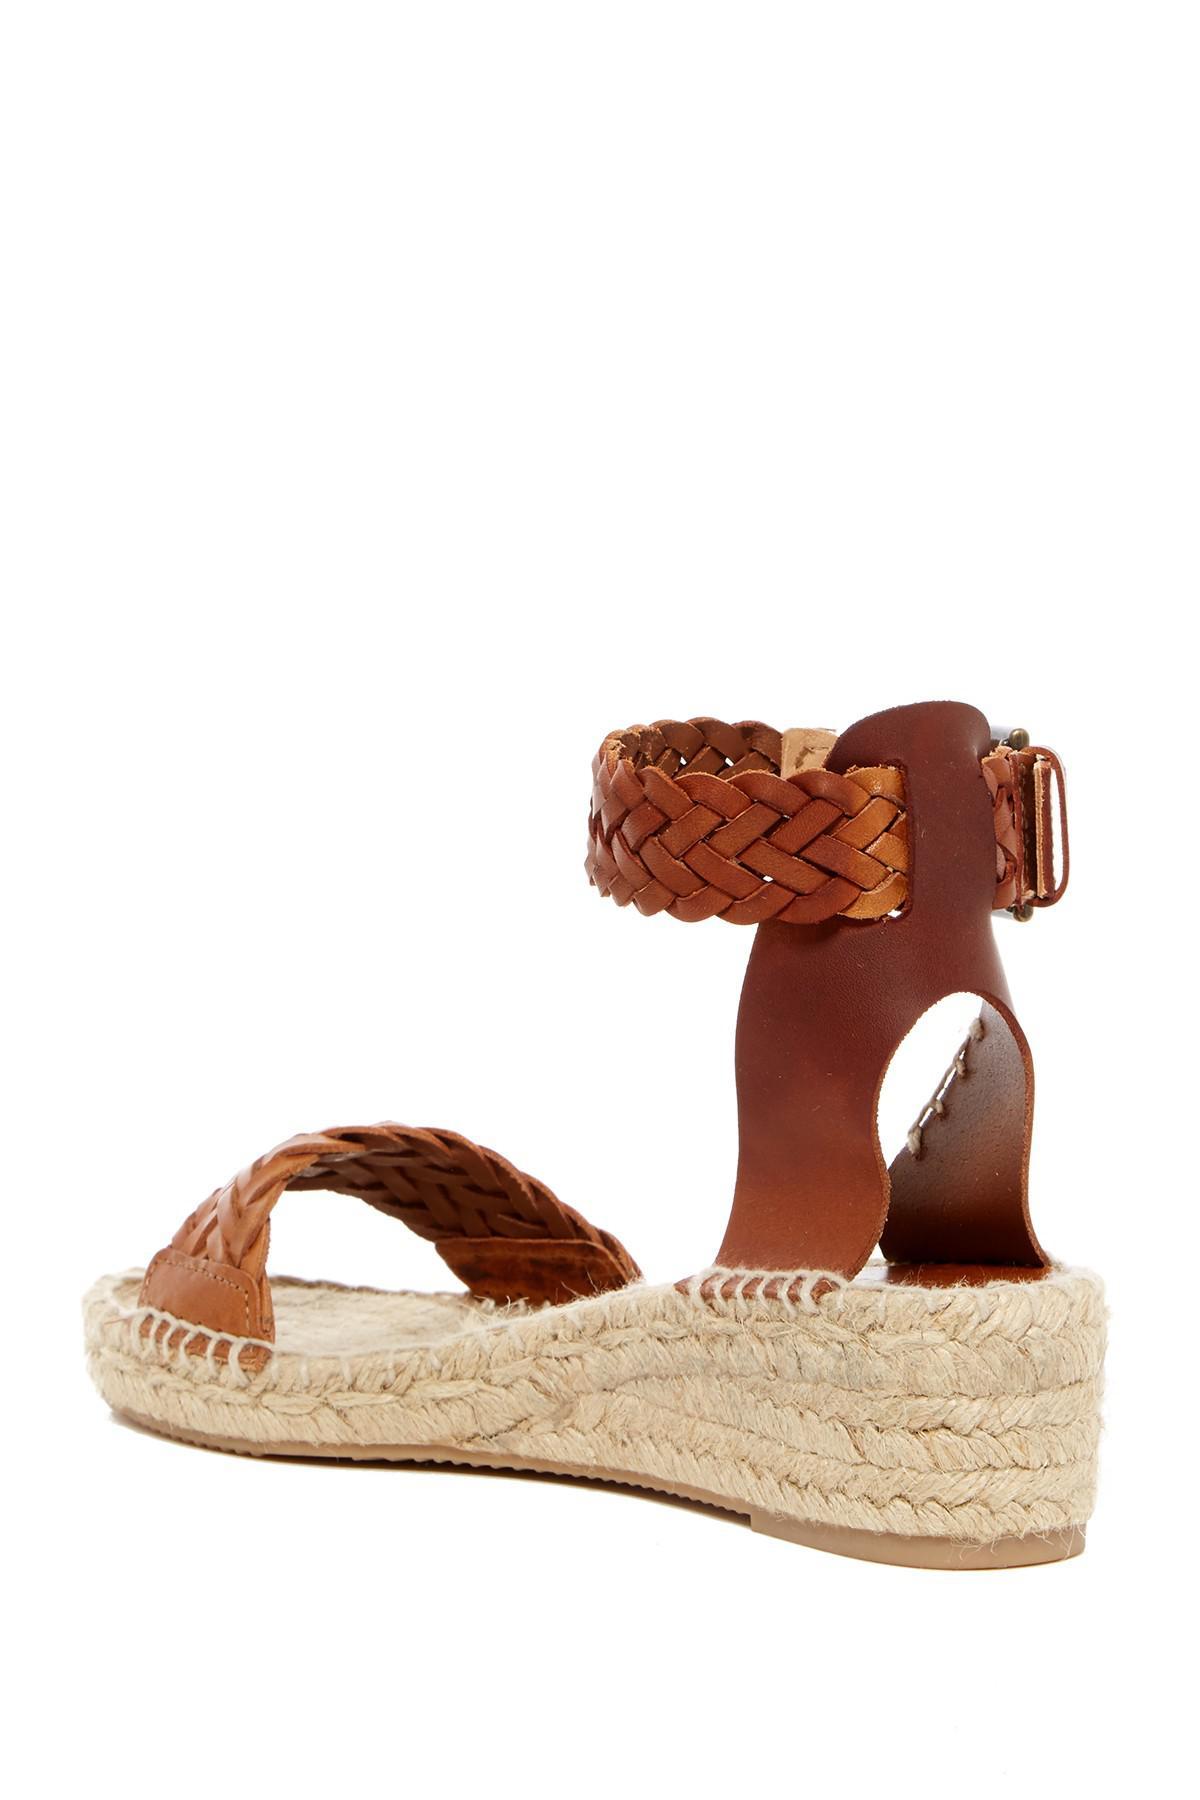 32800562fbf Lyst - Soludos Woven Open Toe Demi Wedge Sandal in Brown